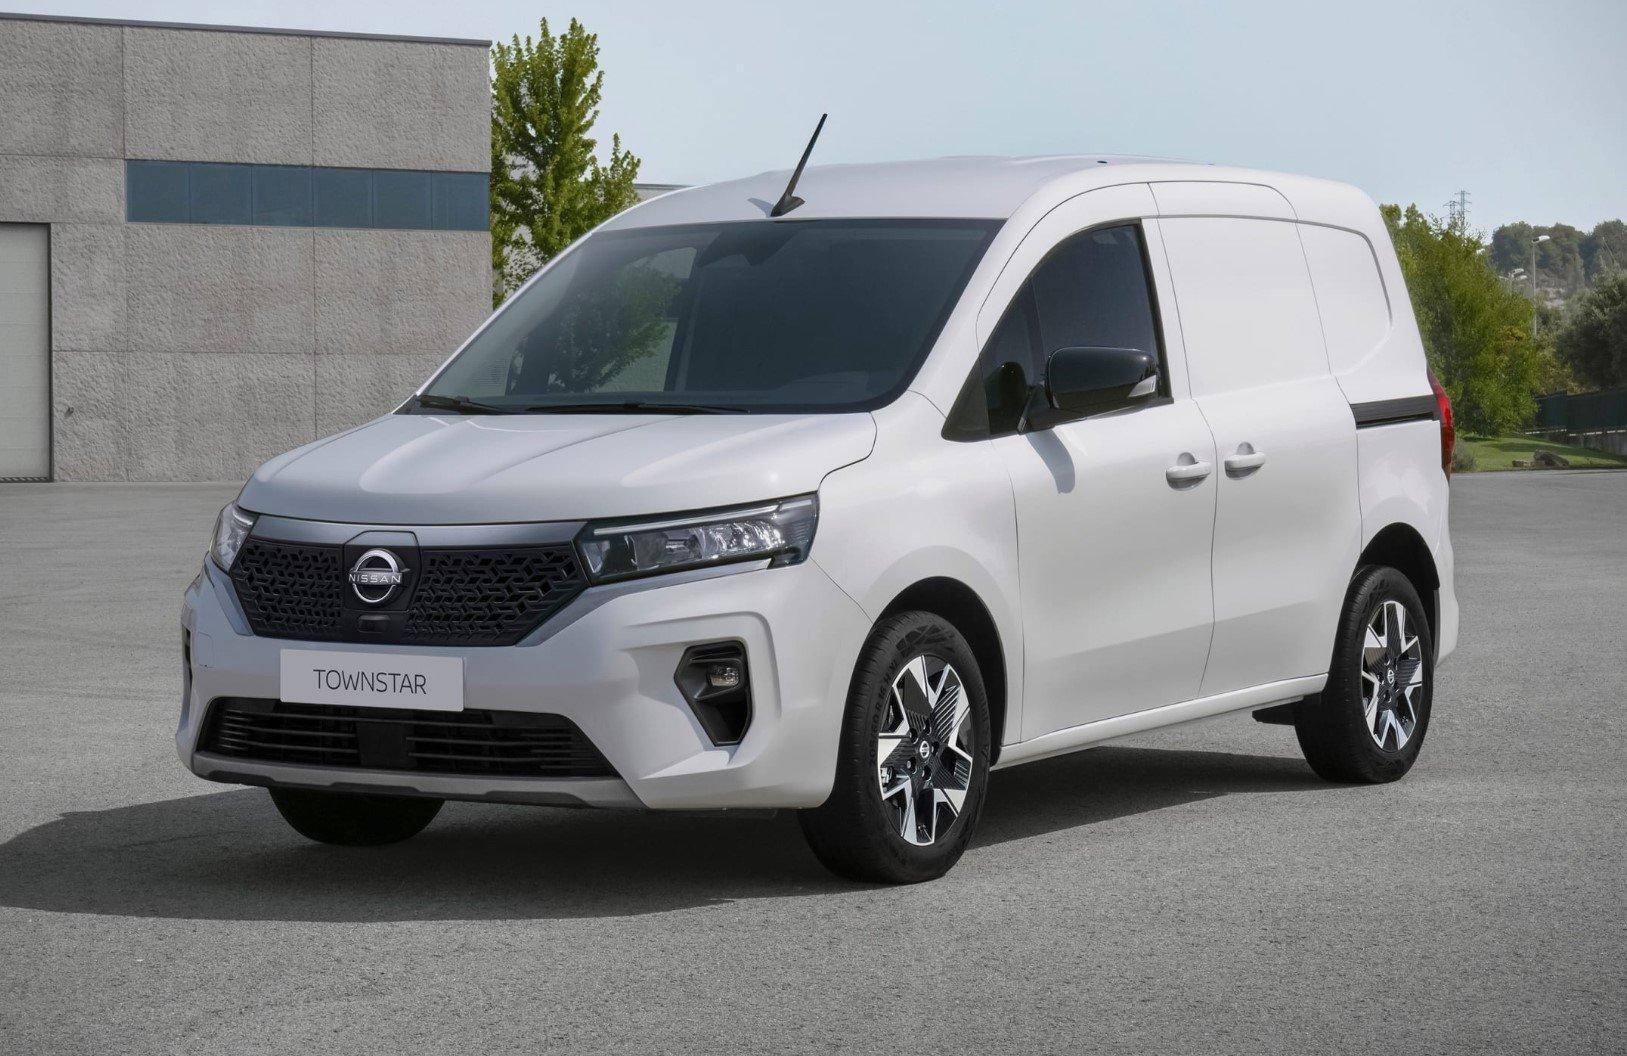 2021 Nissan Townstar 4